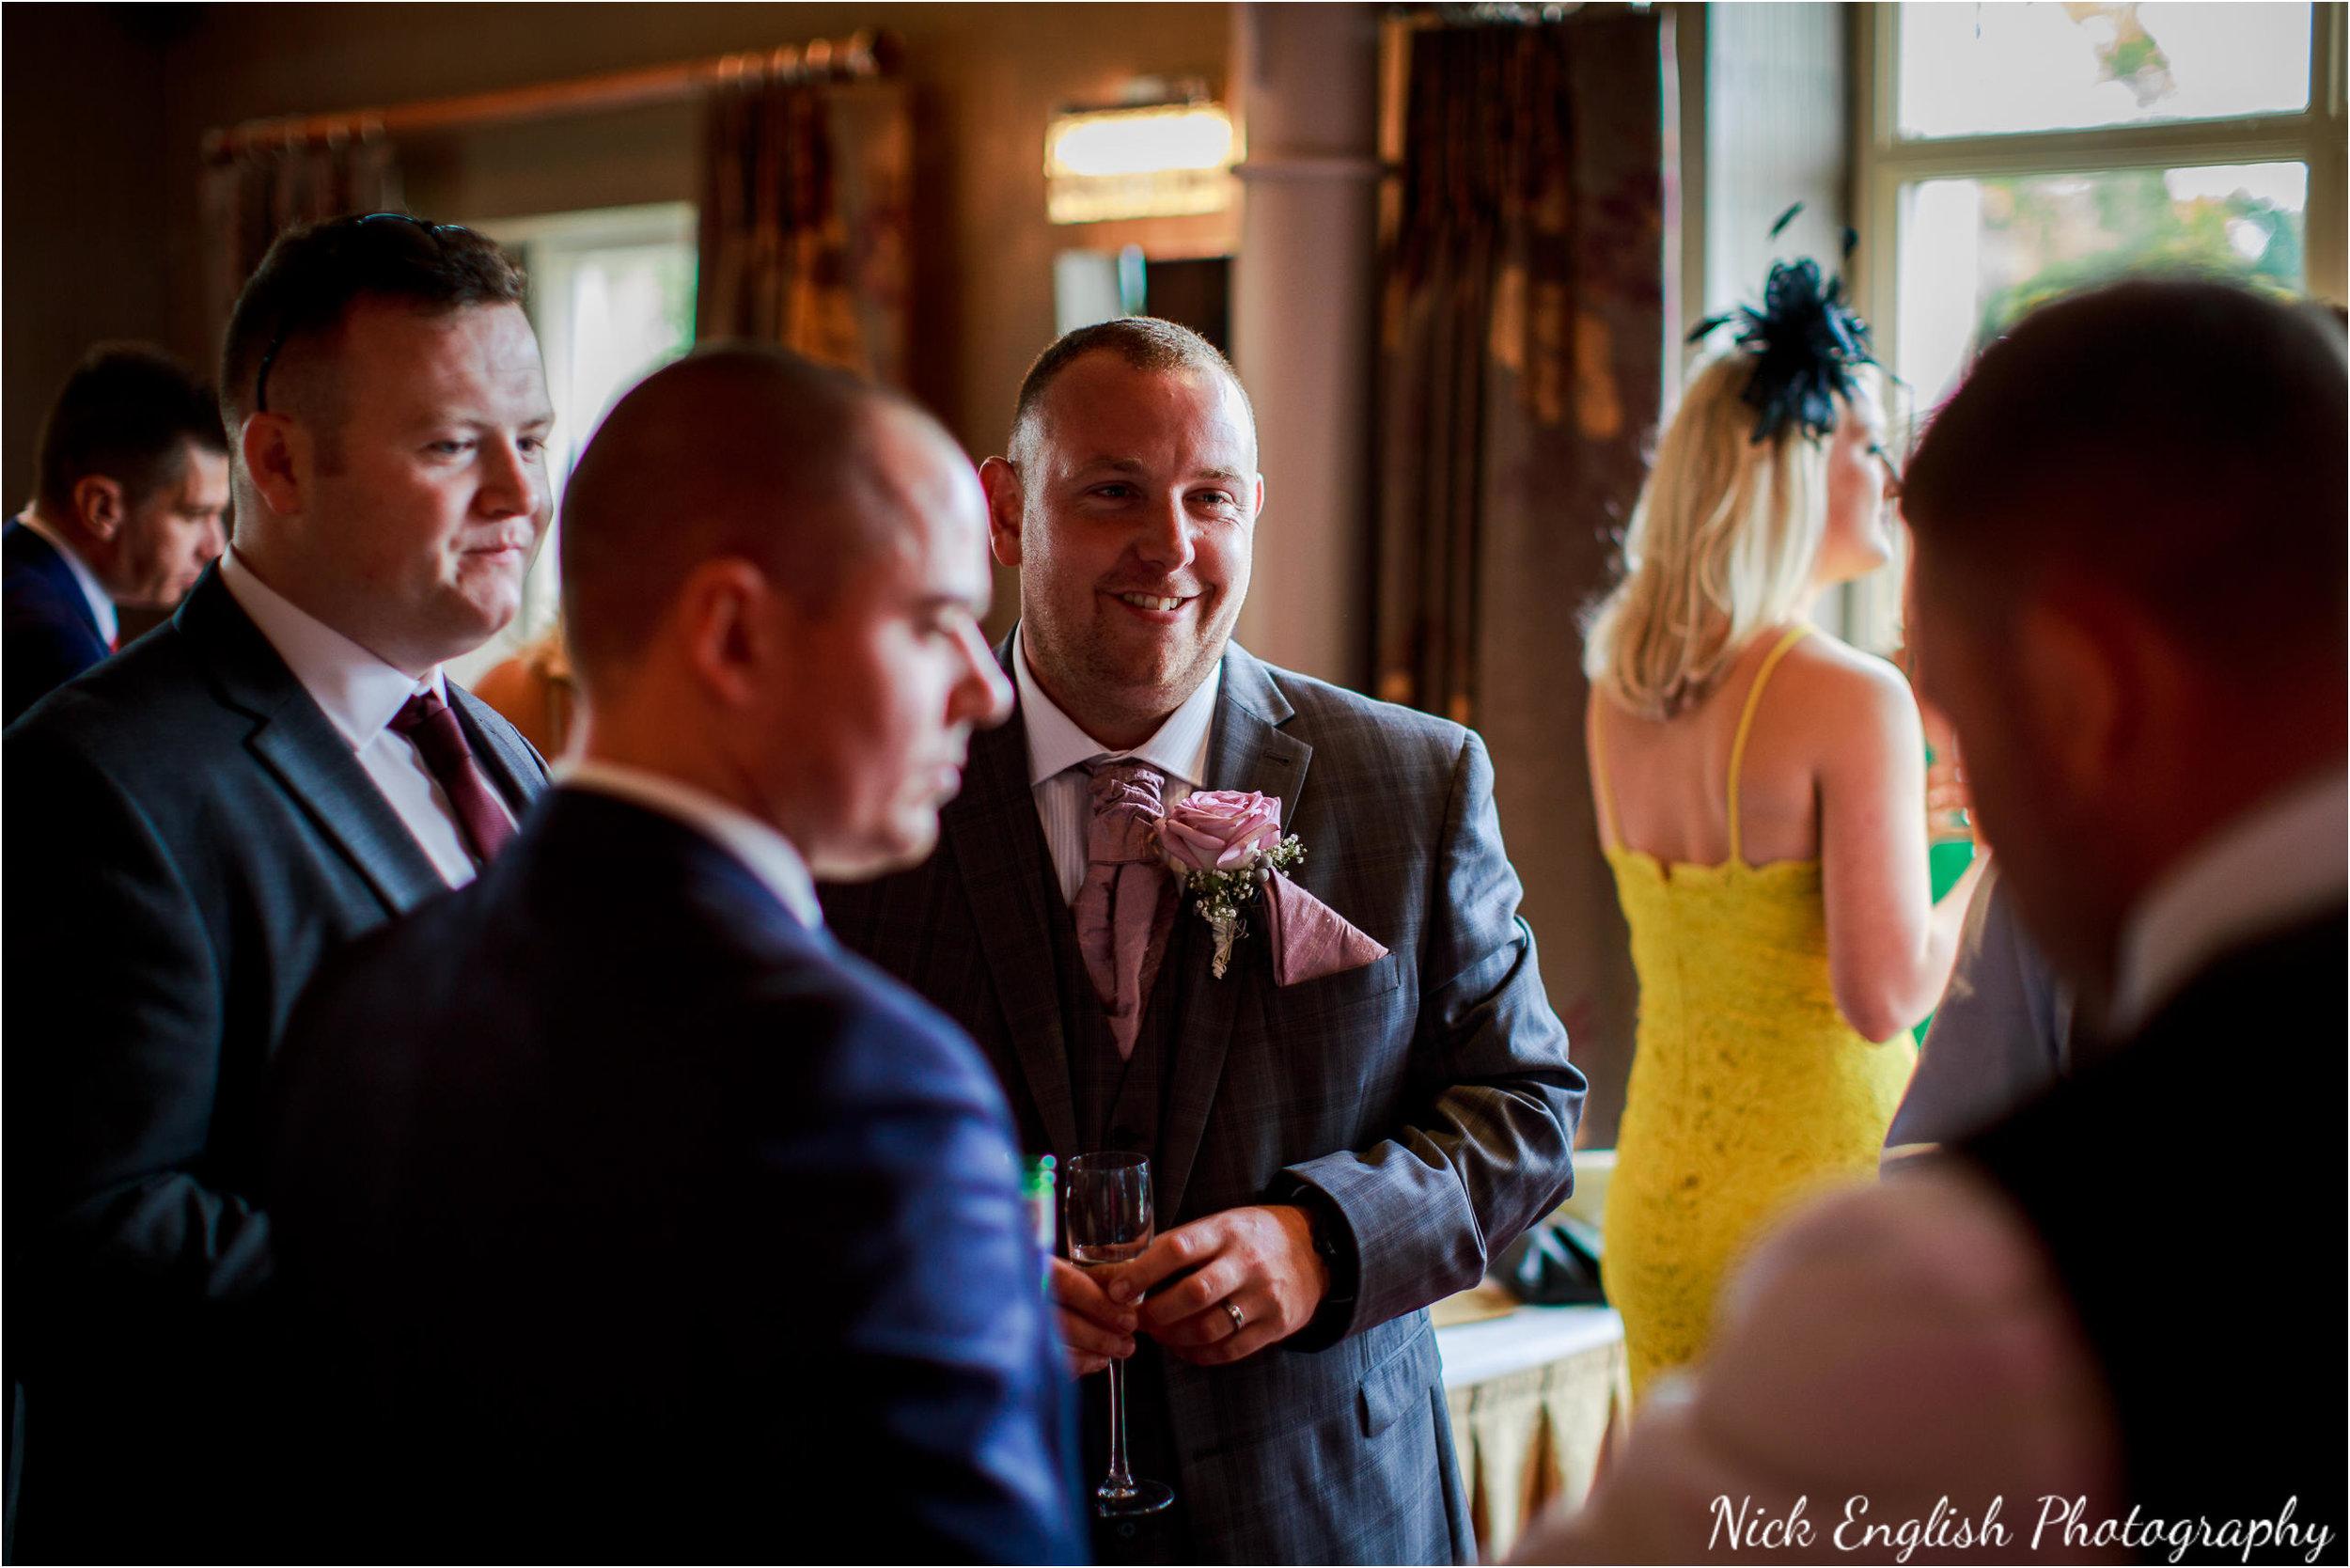 Stacey-Ash-Wedding-Photographs-Stanley-House-Preston-Lancashire-107.jpg